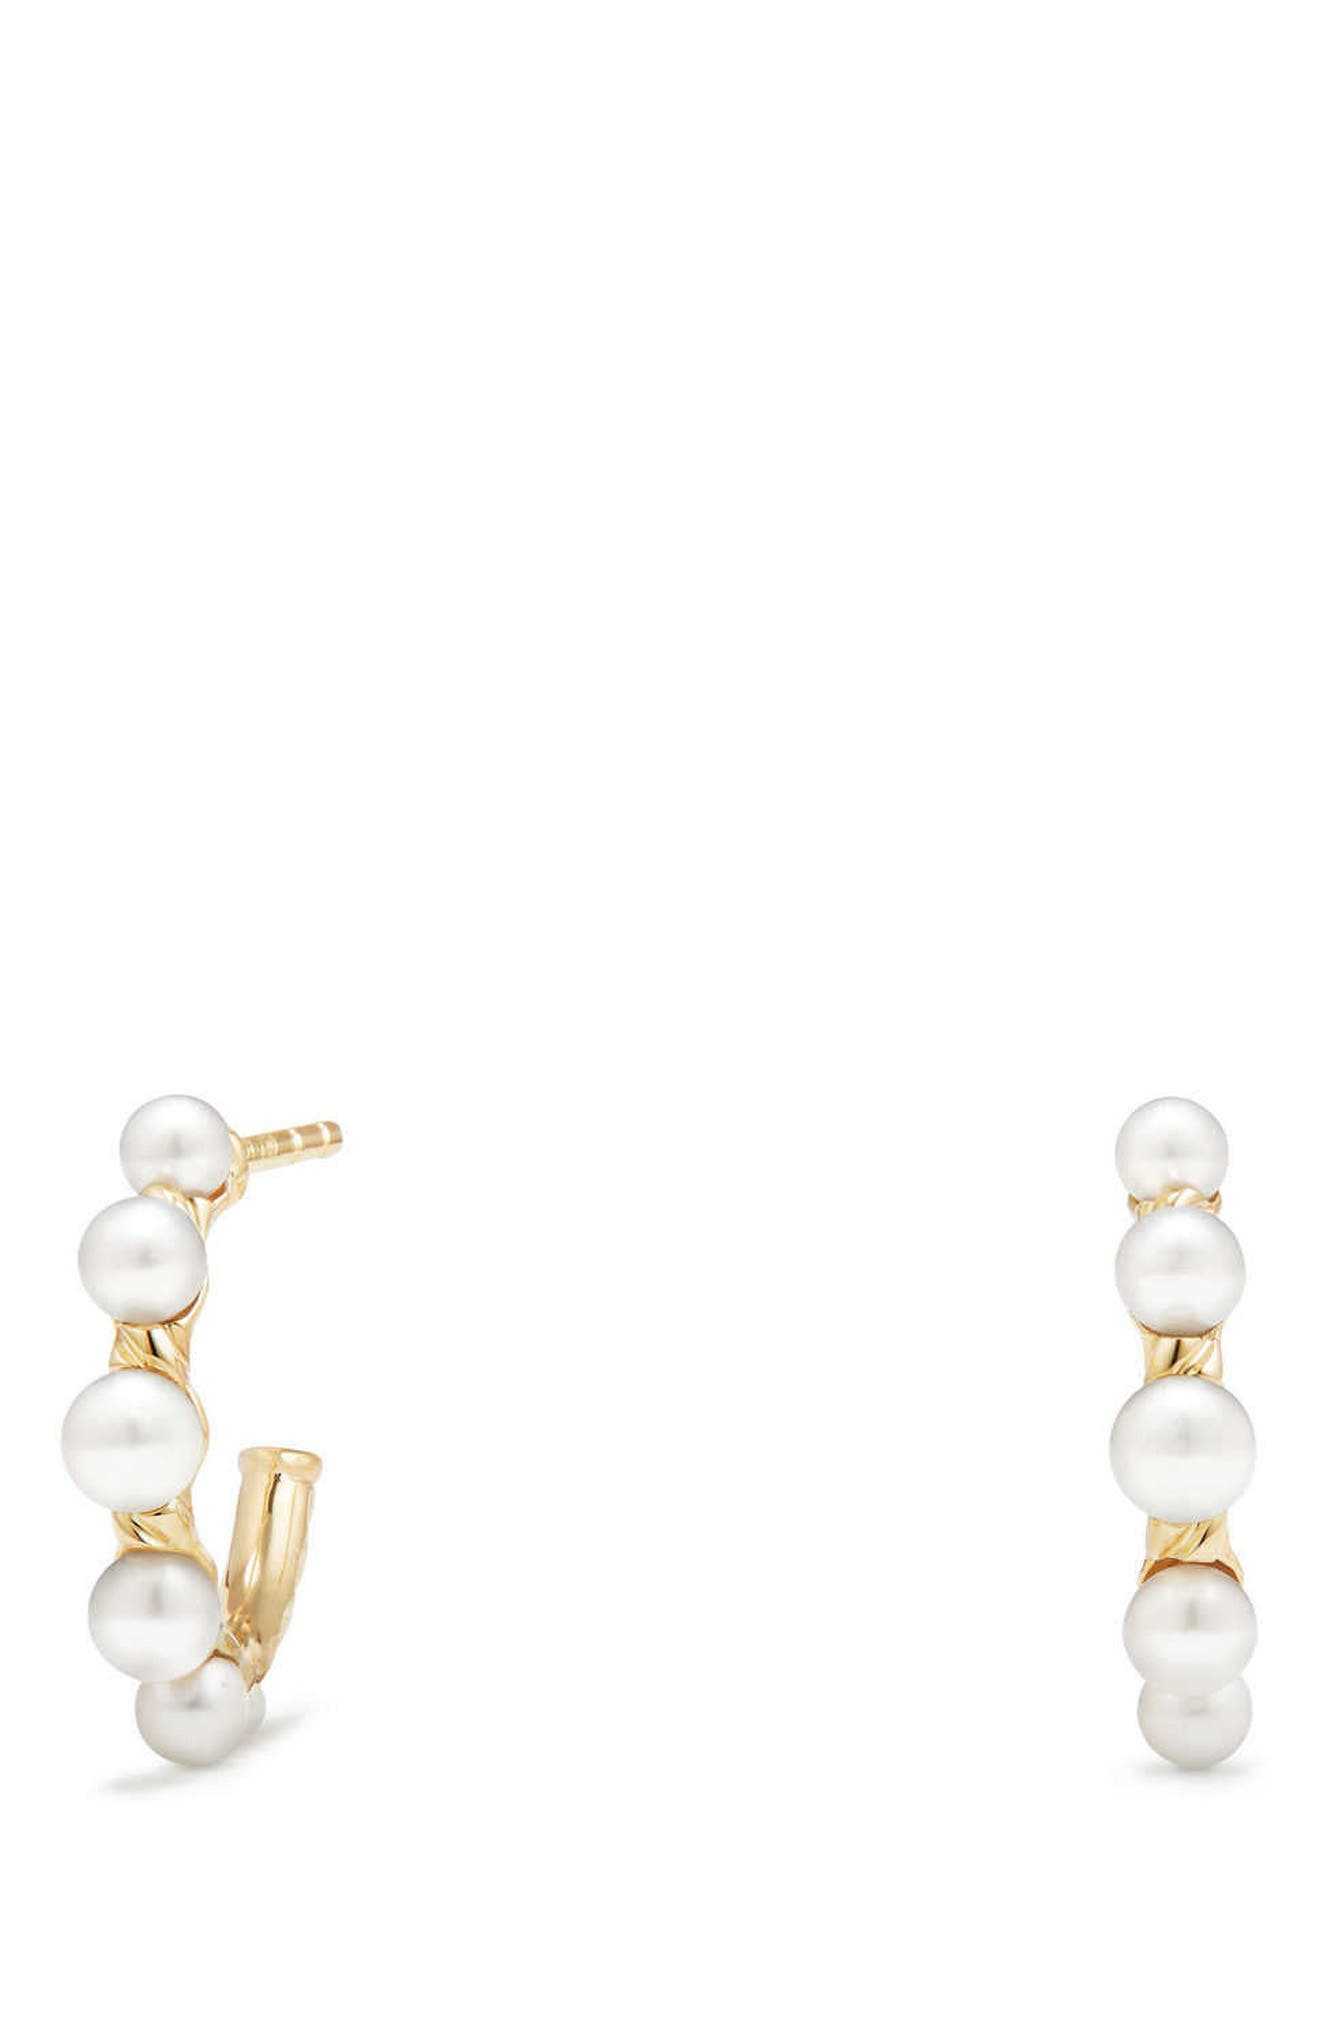 Petite Perle Graduated Pearl Hoop Earrings in 18K Gold,                             Alternate thumbnail 2, color,                             GOLD/ PEARL